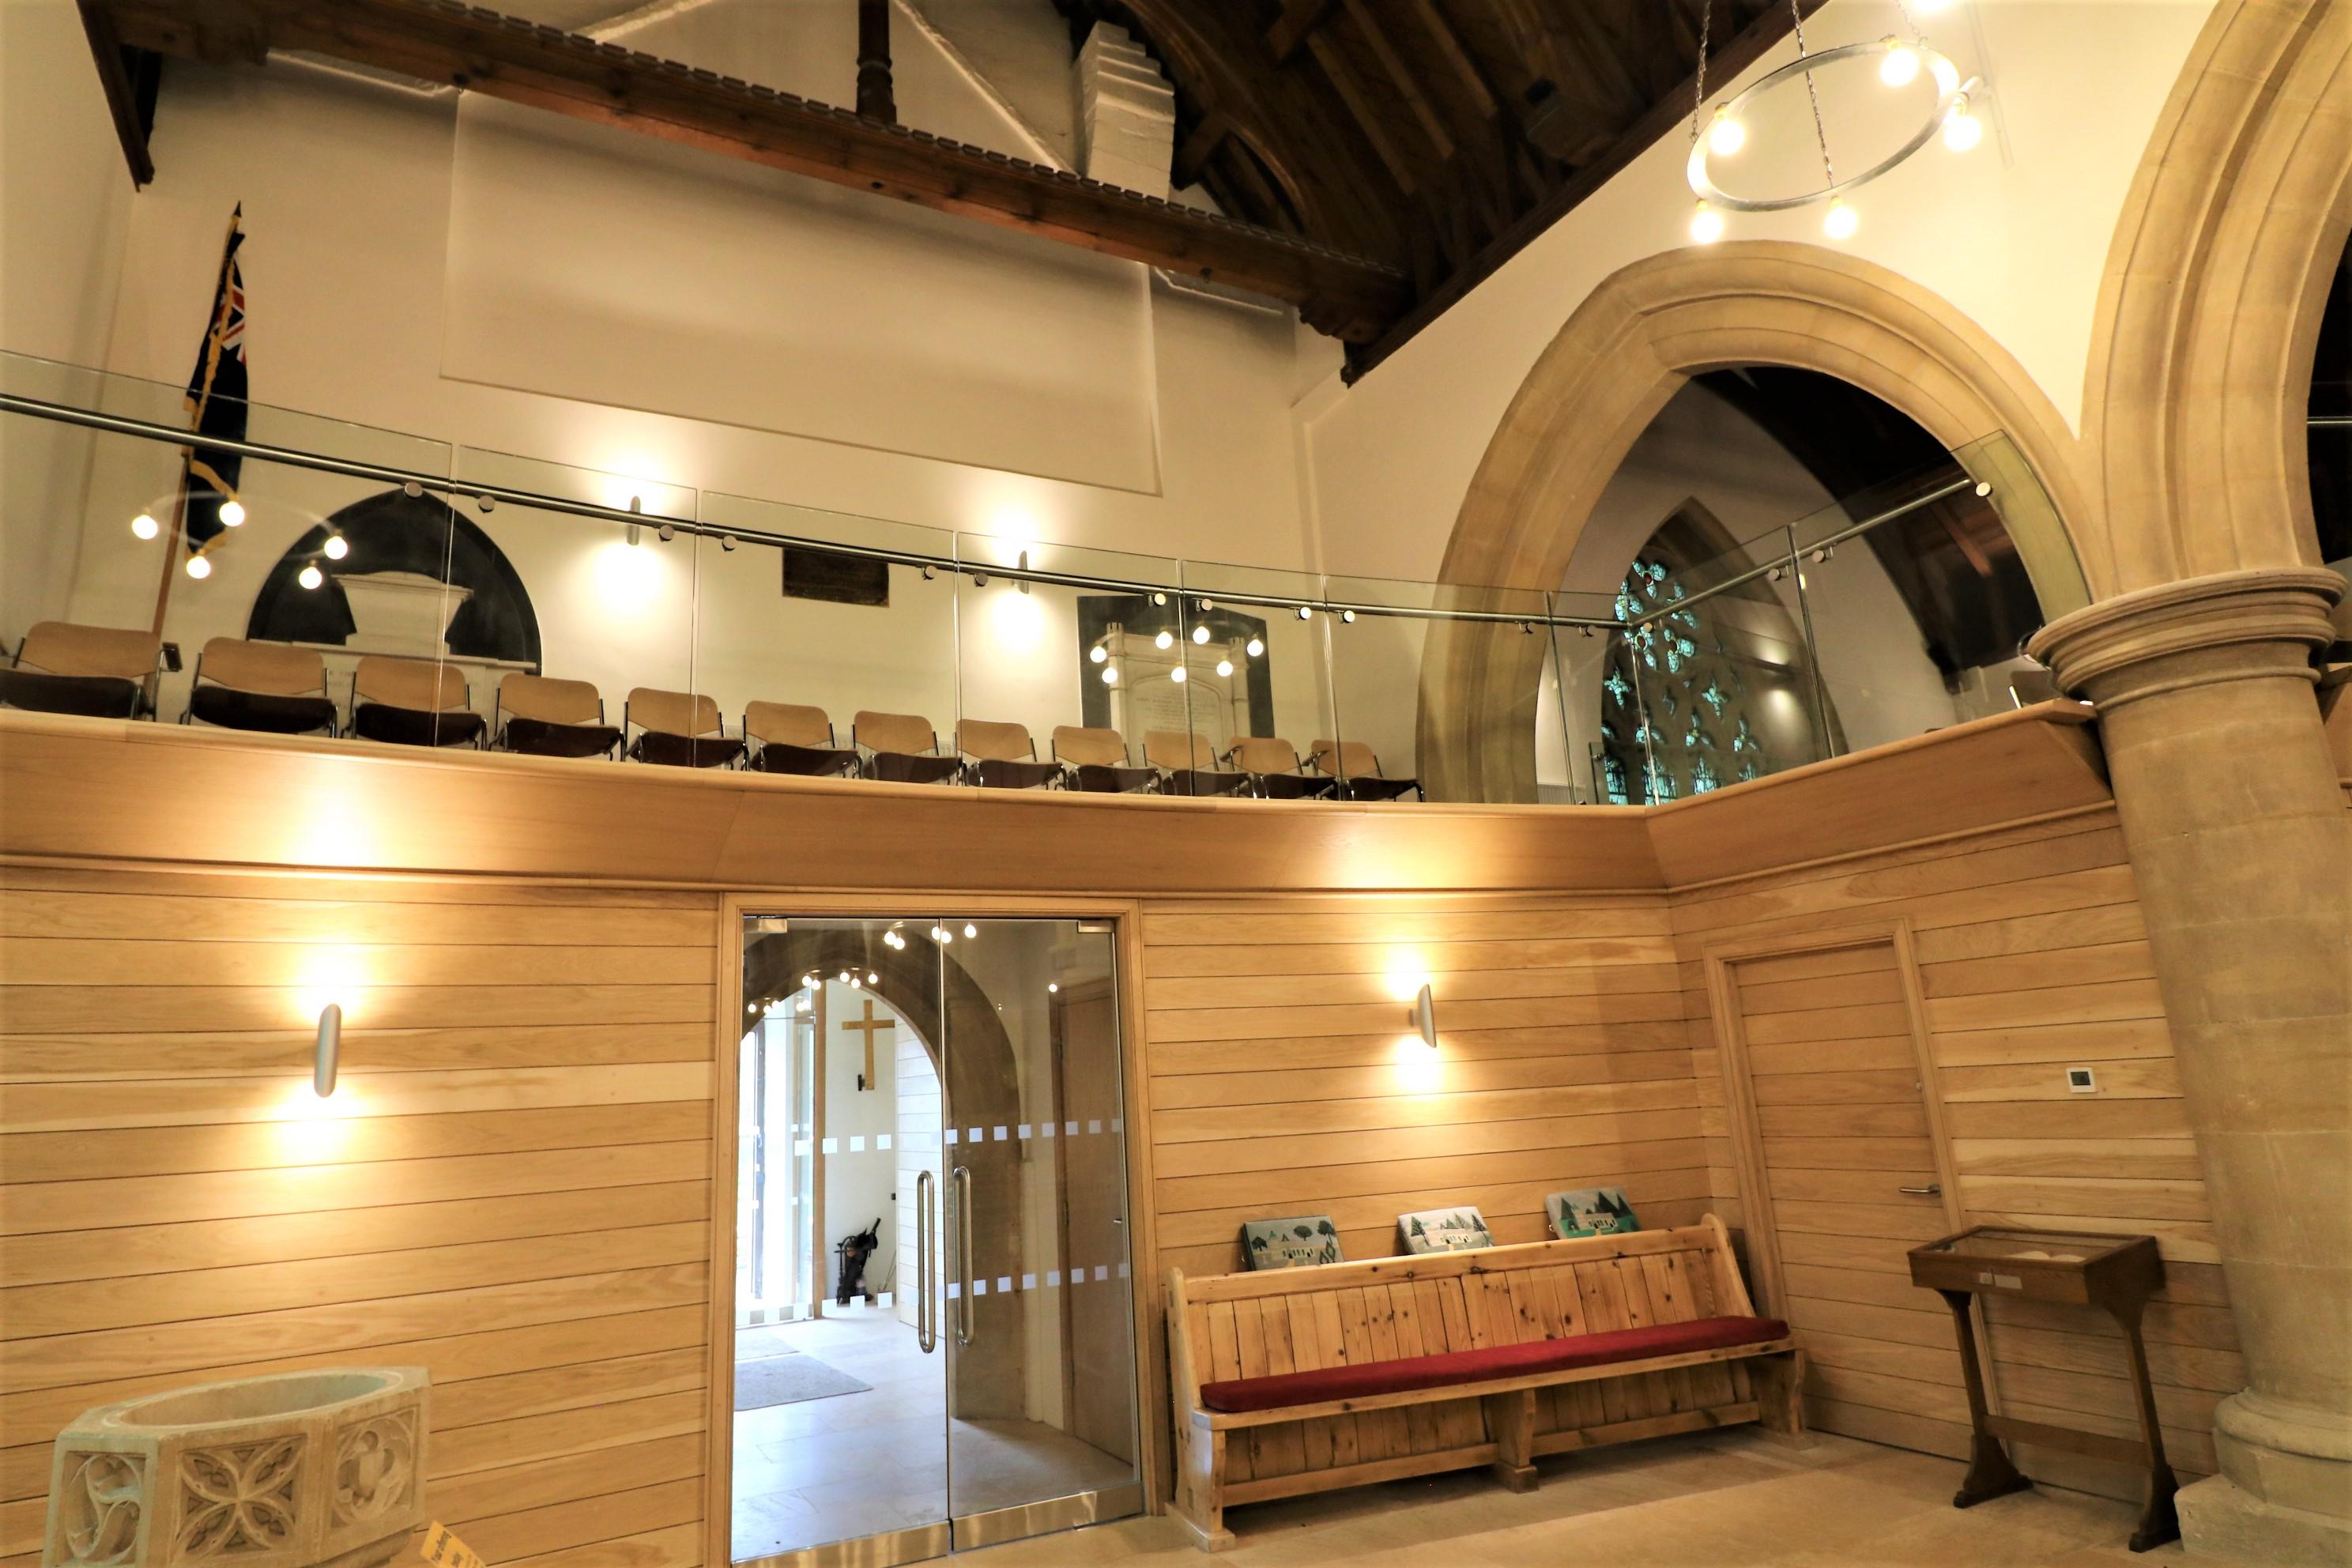 frameless-glass-balustrade-to-mezzanine-gallery-st-lawrence-church